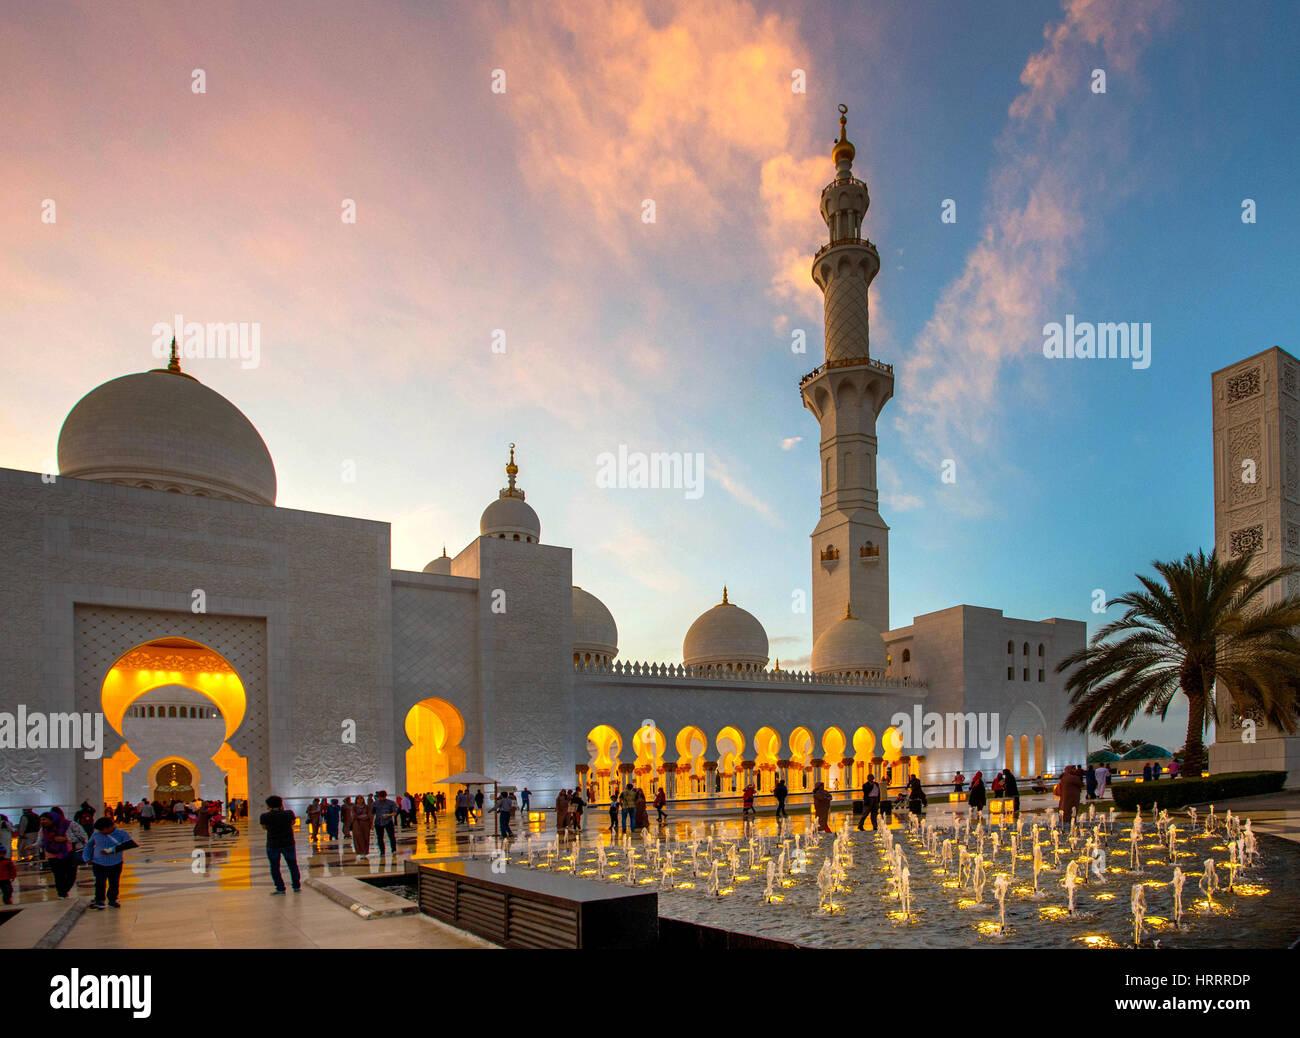 Grande Mosquée de Sheikh Zayed à Abu Dhabi, Emirats Arabes Unis. Photo Stock